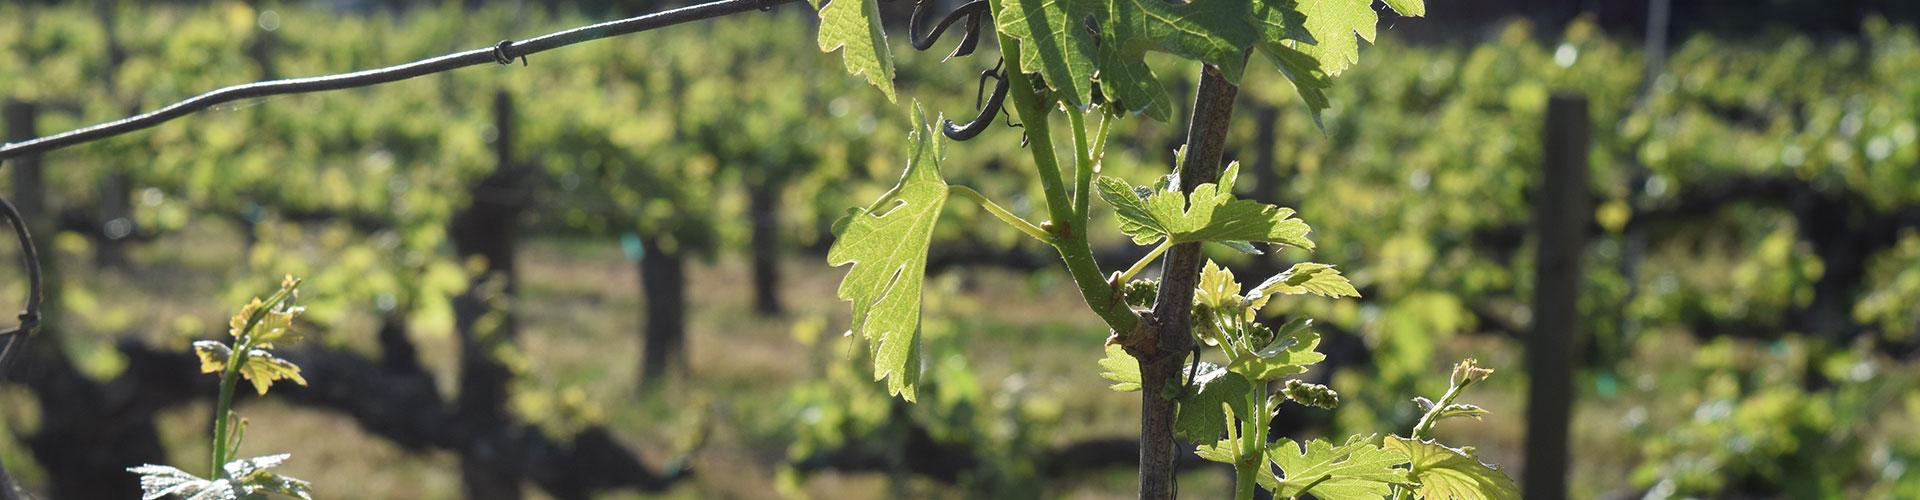 healdsburg california vineyard